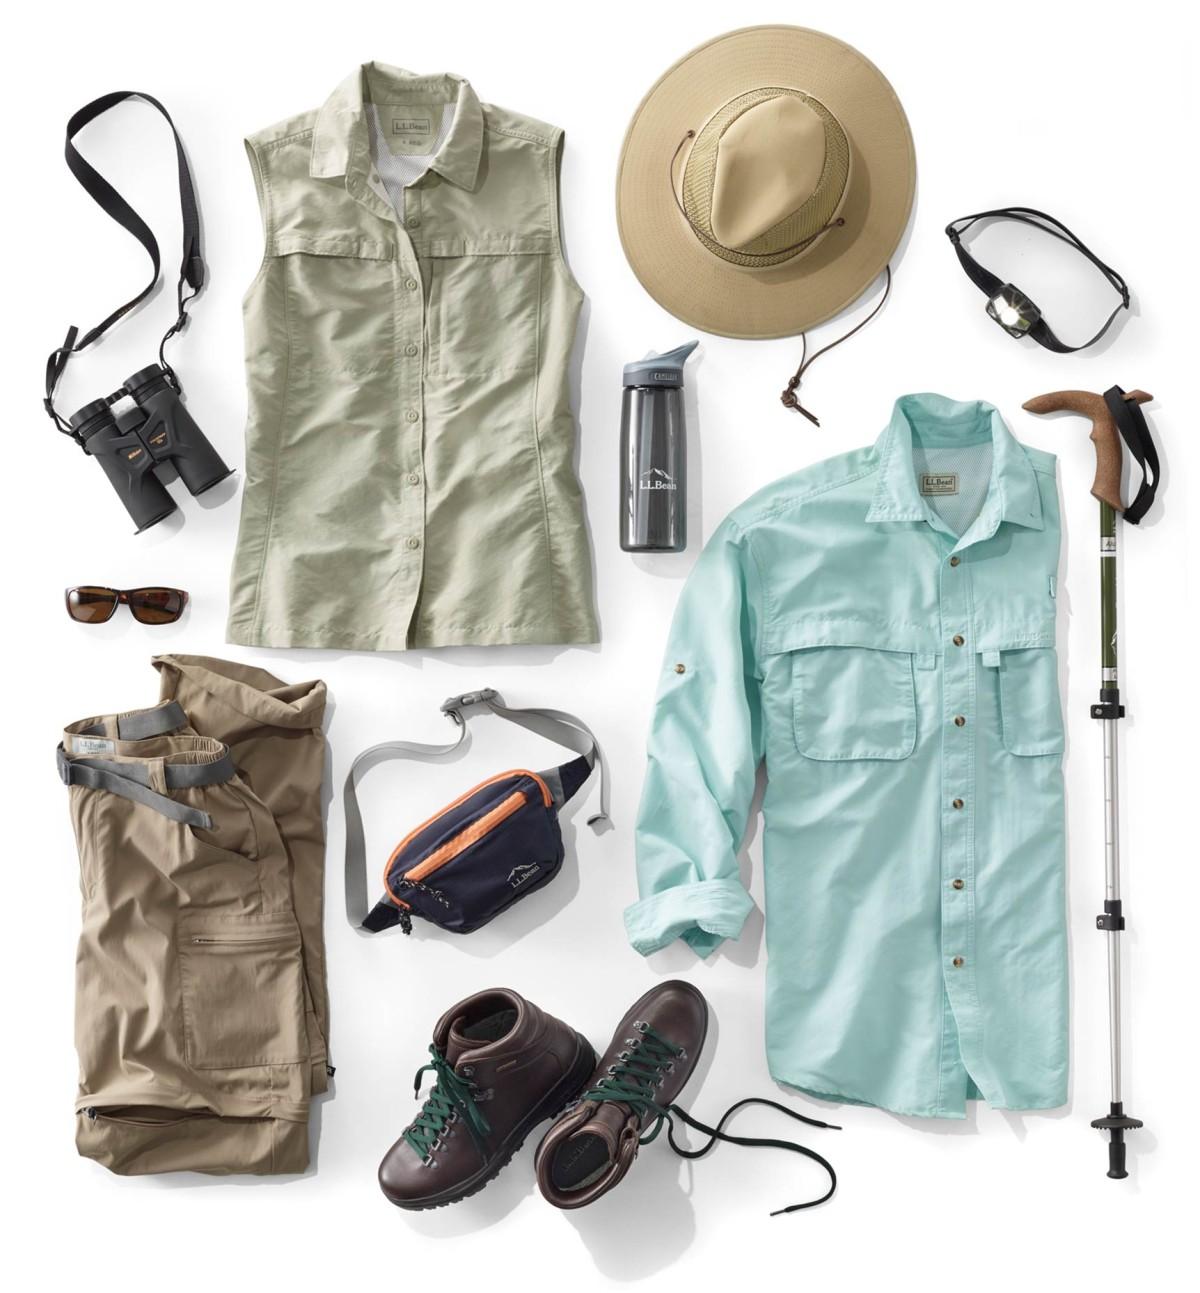 Image of assorted birding gear